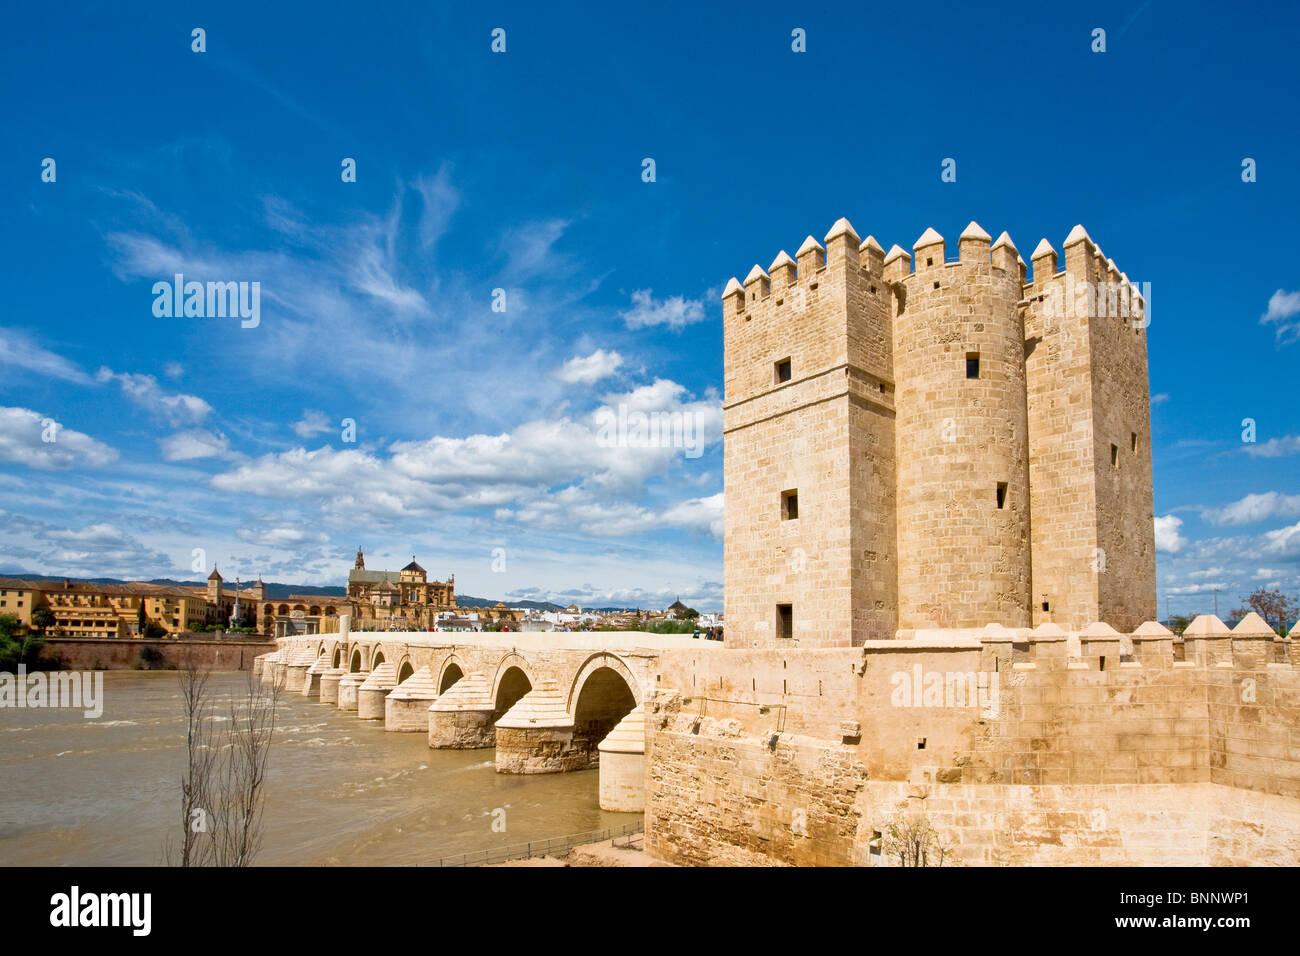 Andalusia Spain bridge Roman tower rook La Lalahorra traveling tourism vacation holidays - Stock Image